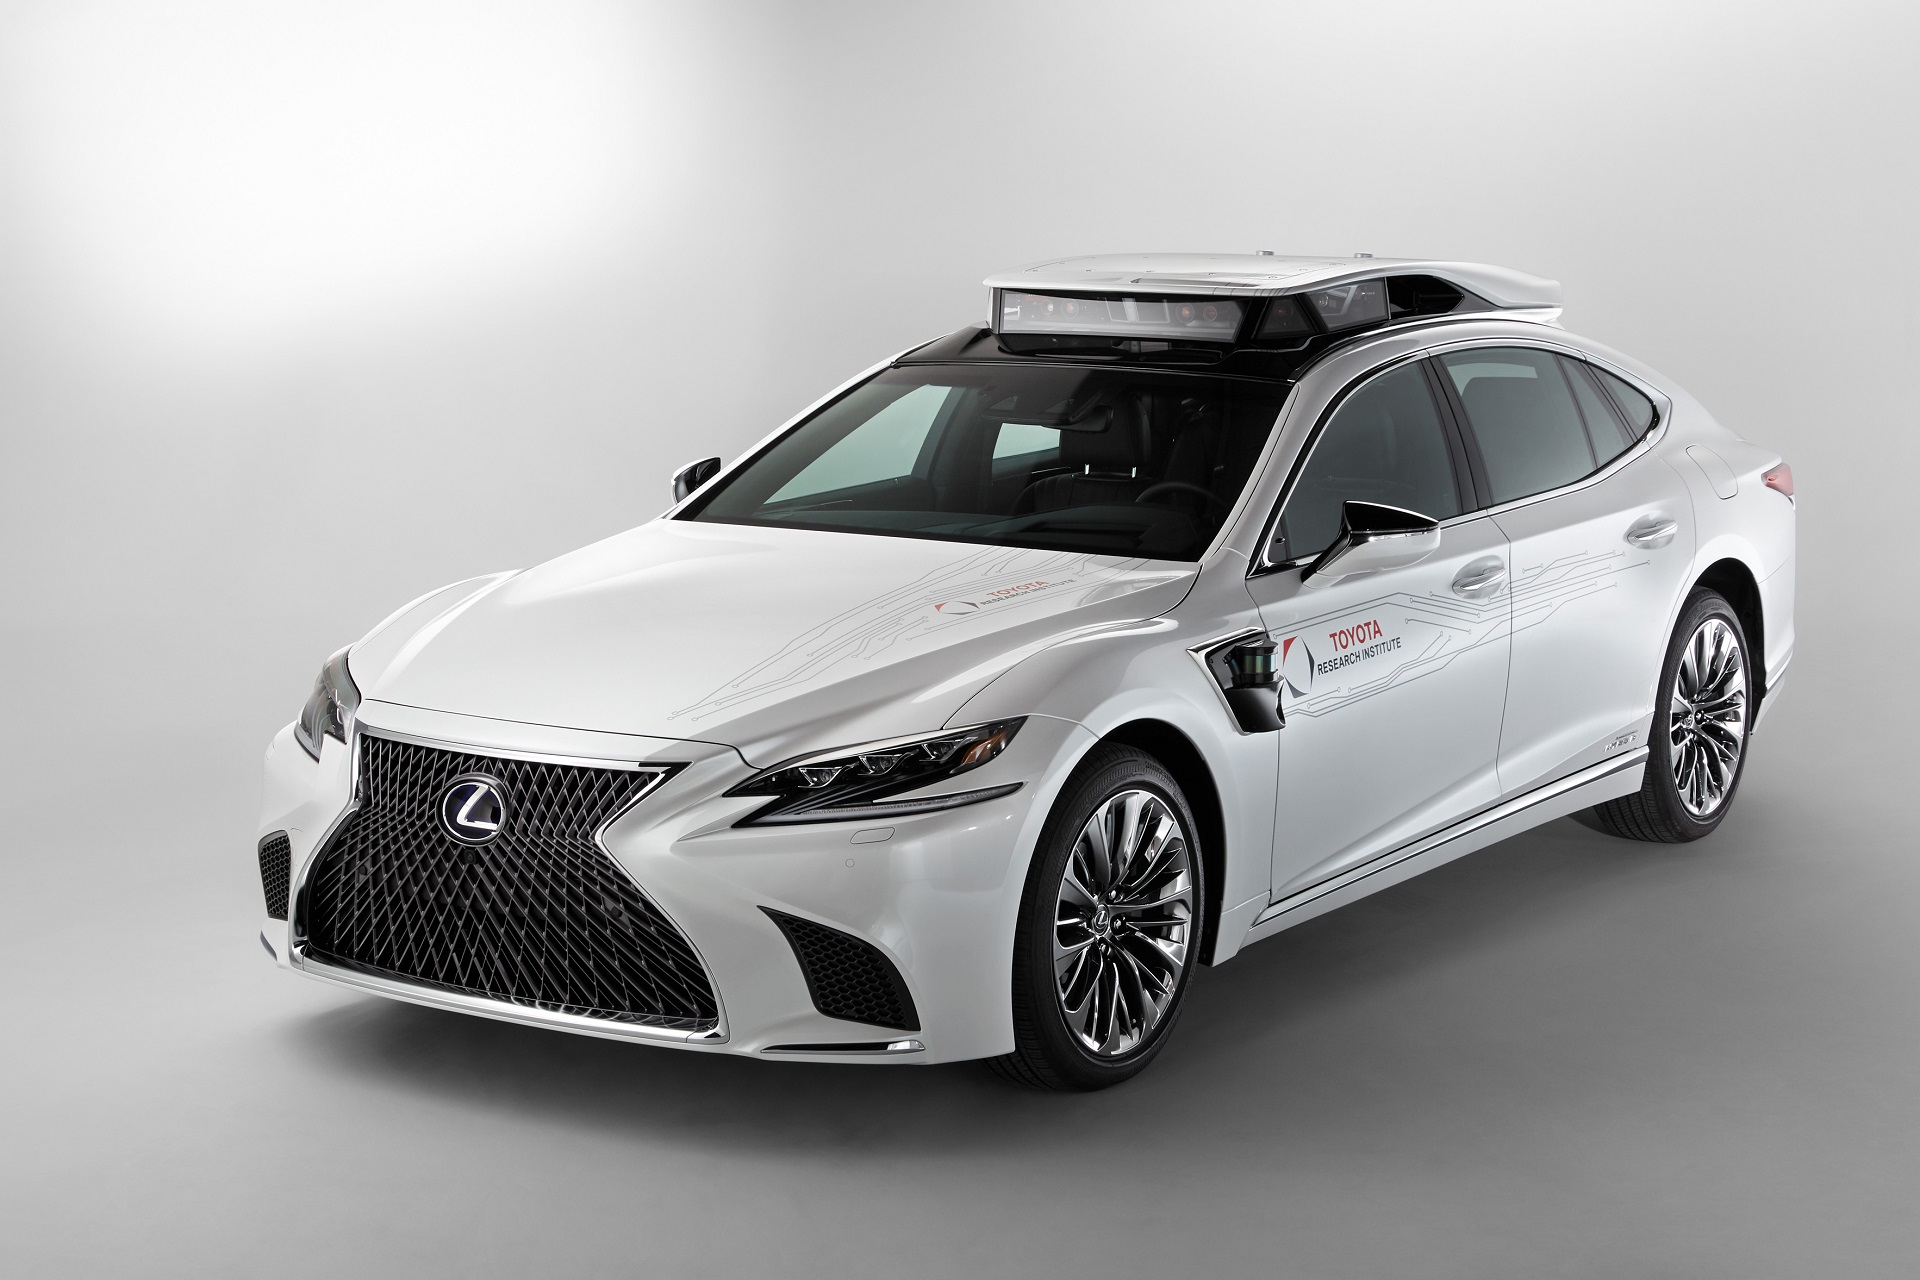 Toyota S Newest Self Driving Test Car Is A Lexus Ls Luxury Sedan